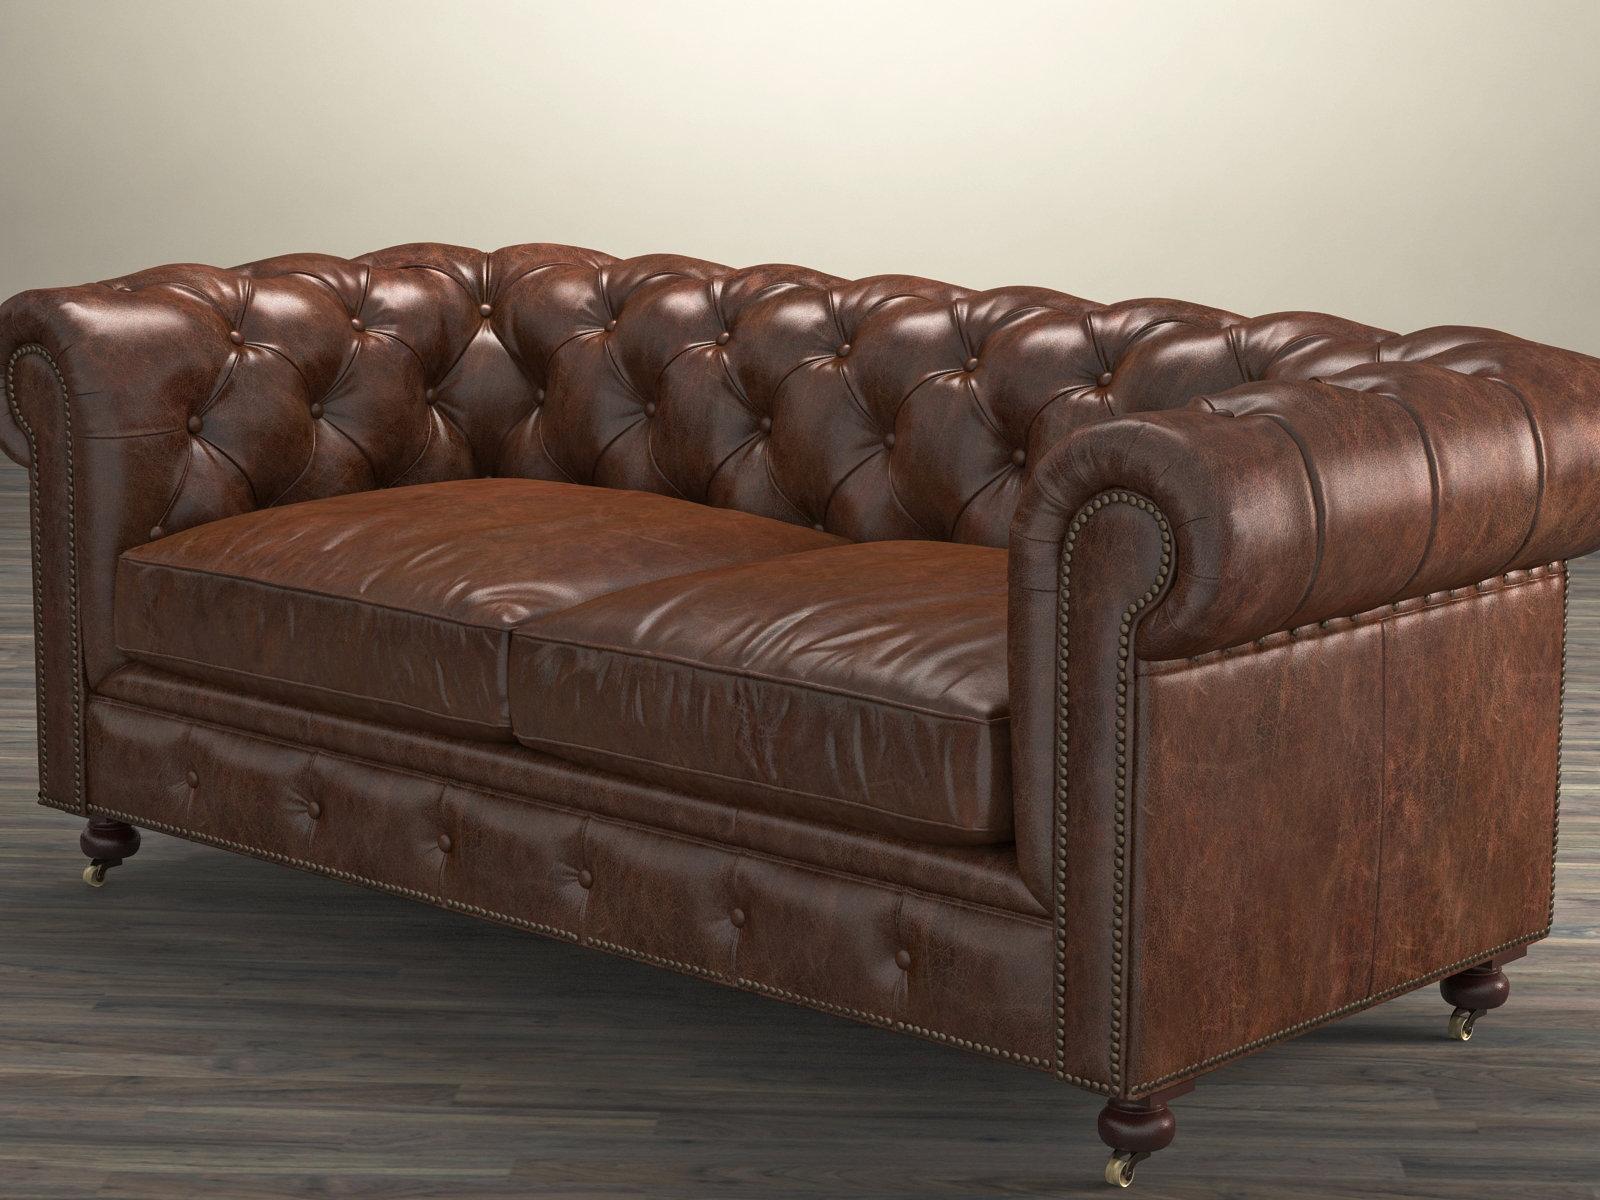 restoration hardware kensington sofa 106 rooms to go leather 72 quot the petite 3d model